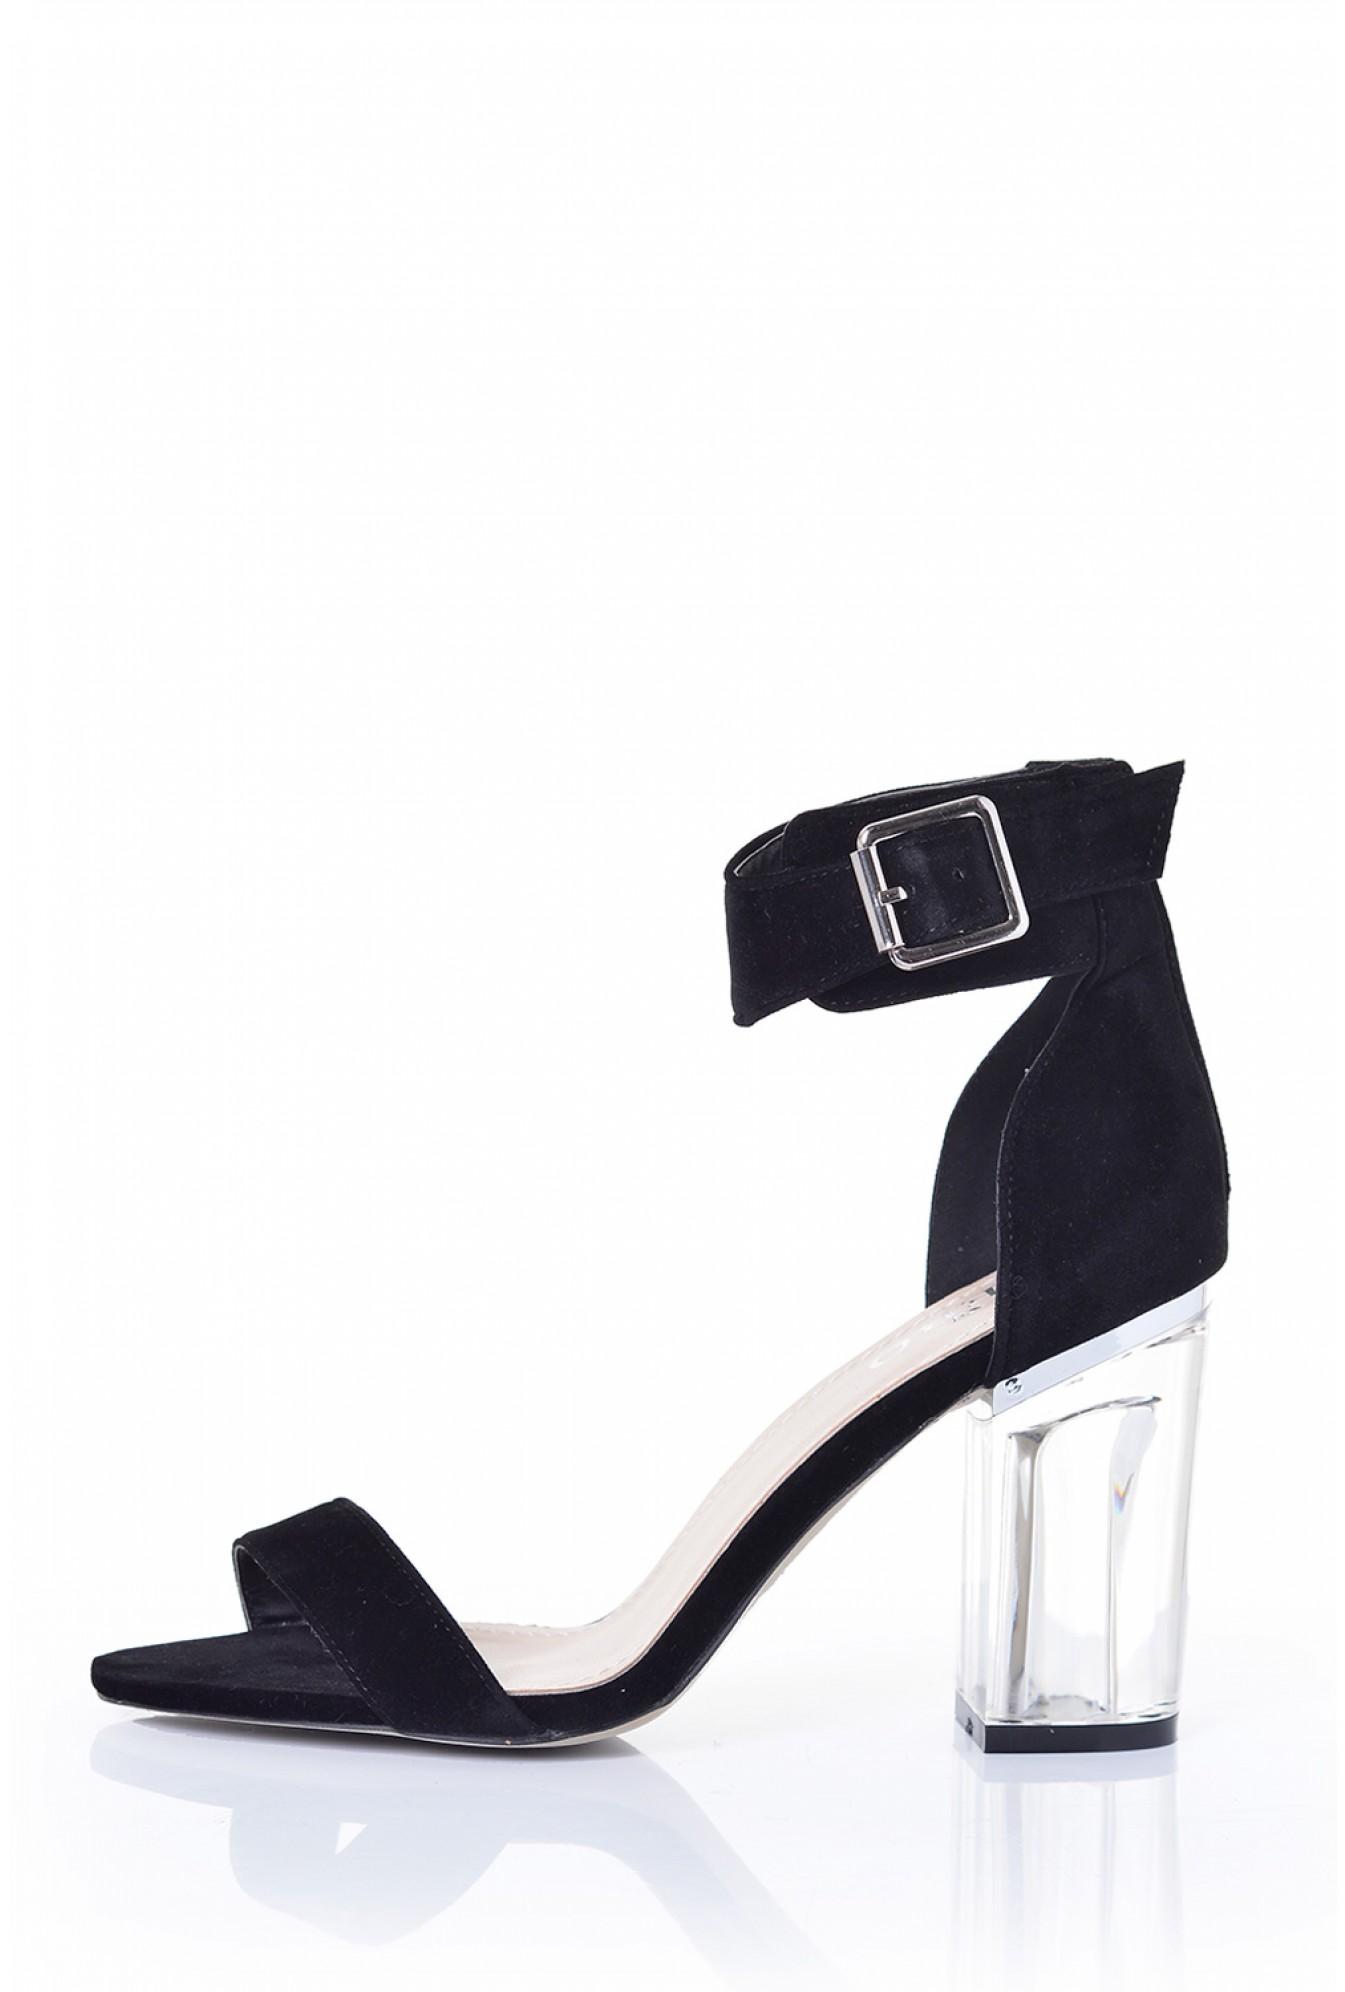 e42ea34e2a5 More Views. Flavia Clear Heel Sandals in Black Suede